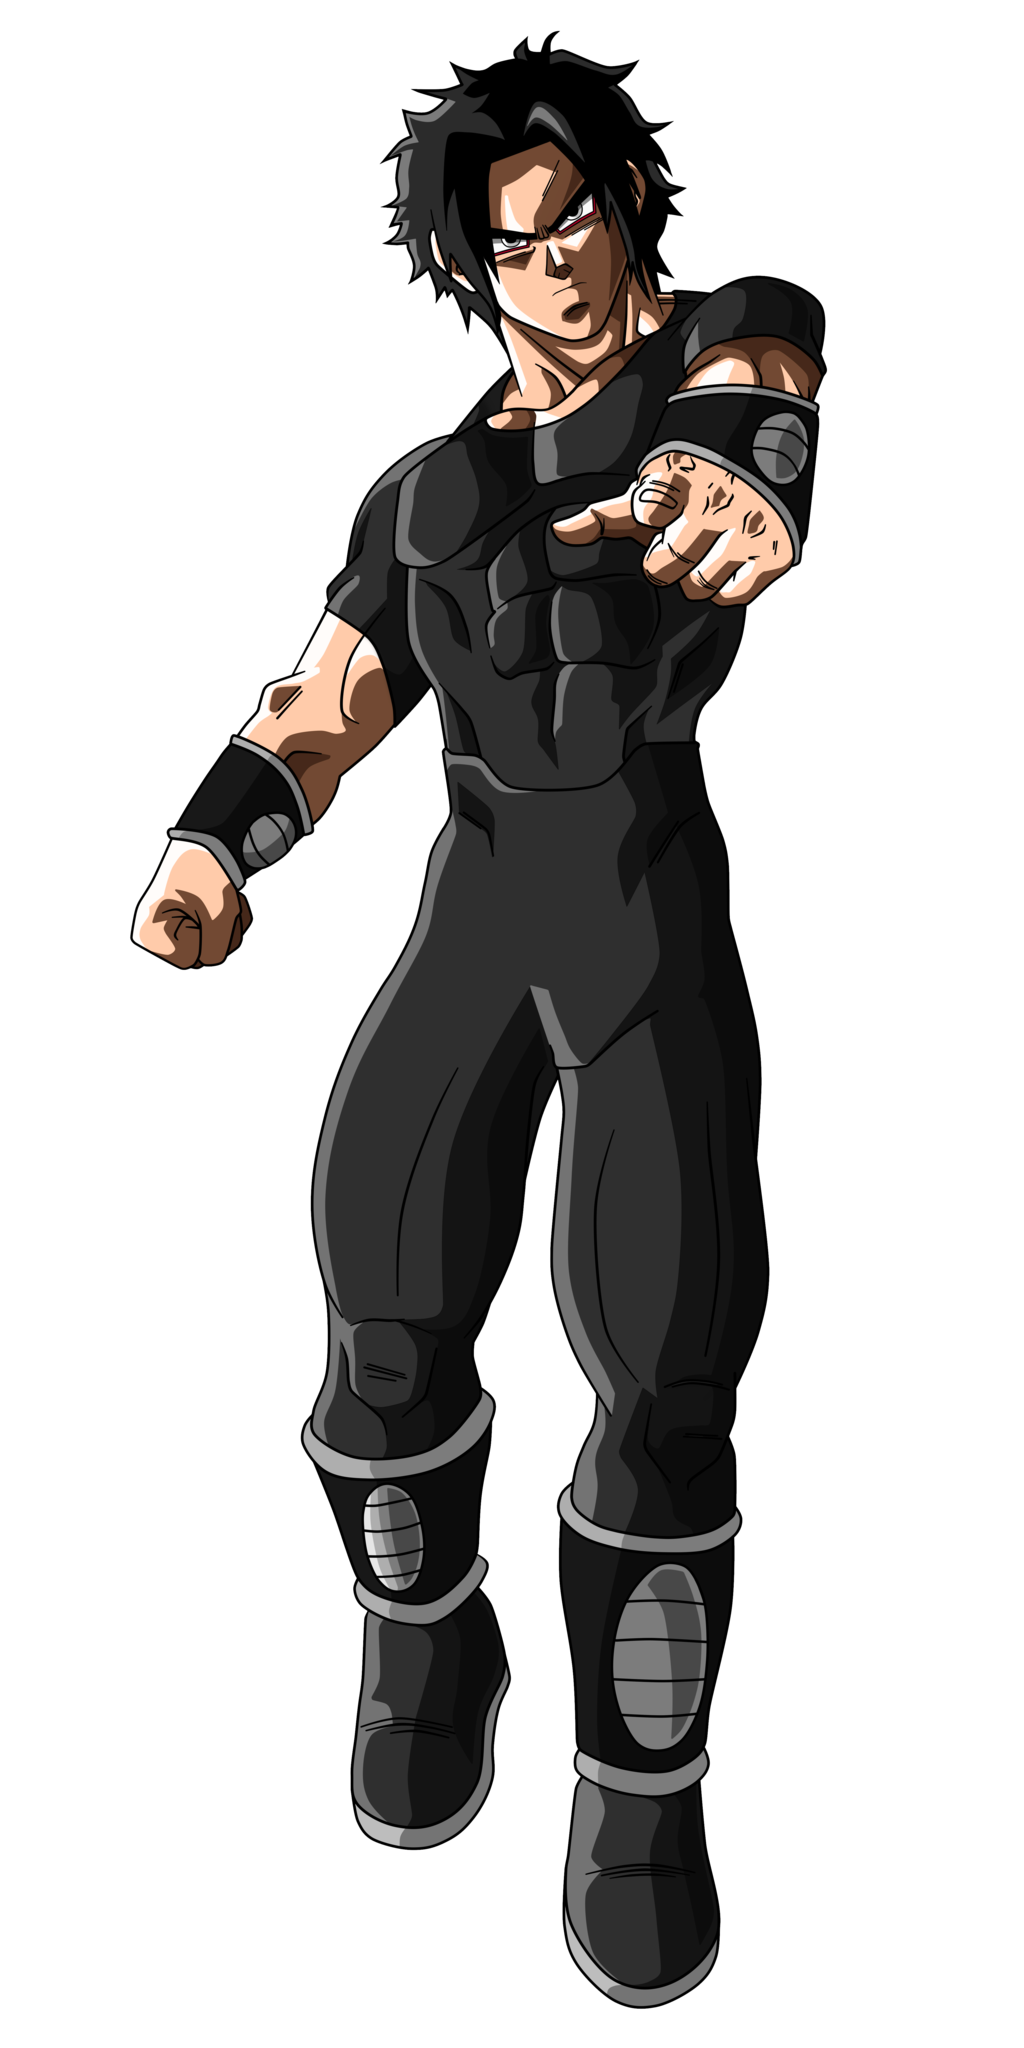 878ca9443706 Guerreiro Z 6 Dbz Characters, Manga Japan, Dragon Ball Z, Dbz Images,